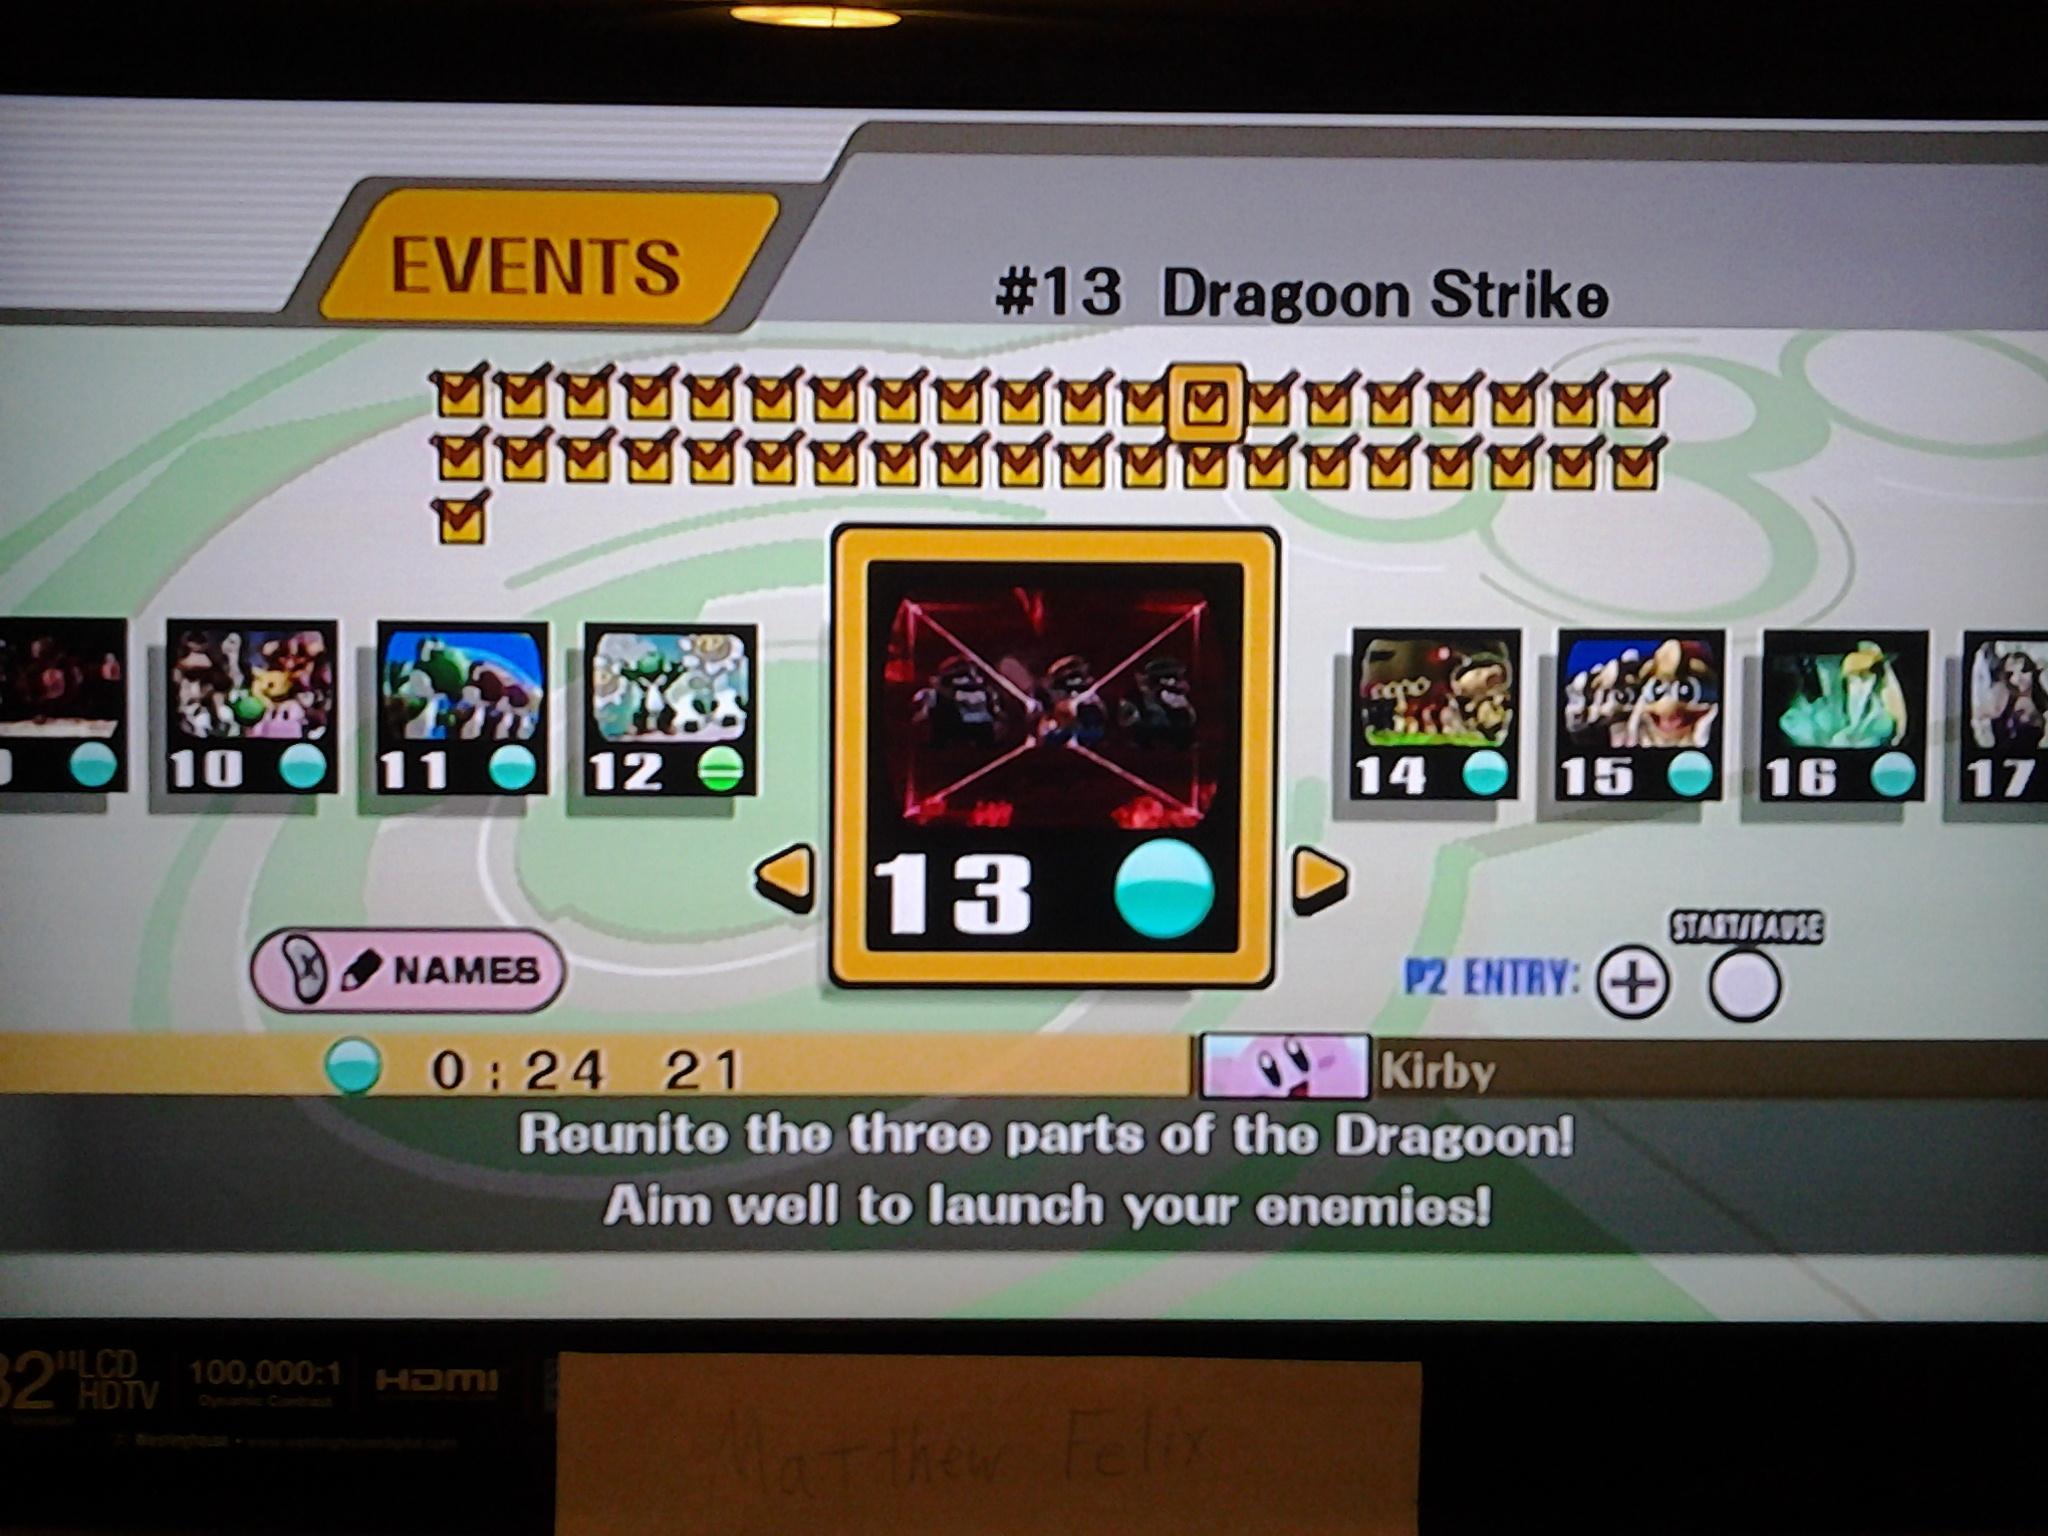 Super Smash Bros. Brawl: Event Match 13: Dragoon Strike [Easy] time of 0:00:24